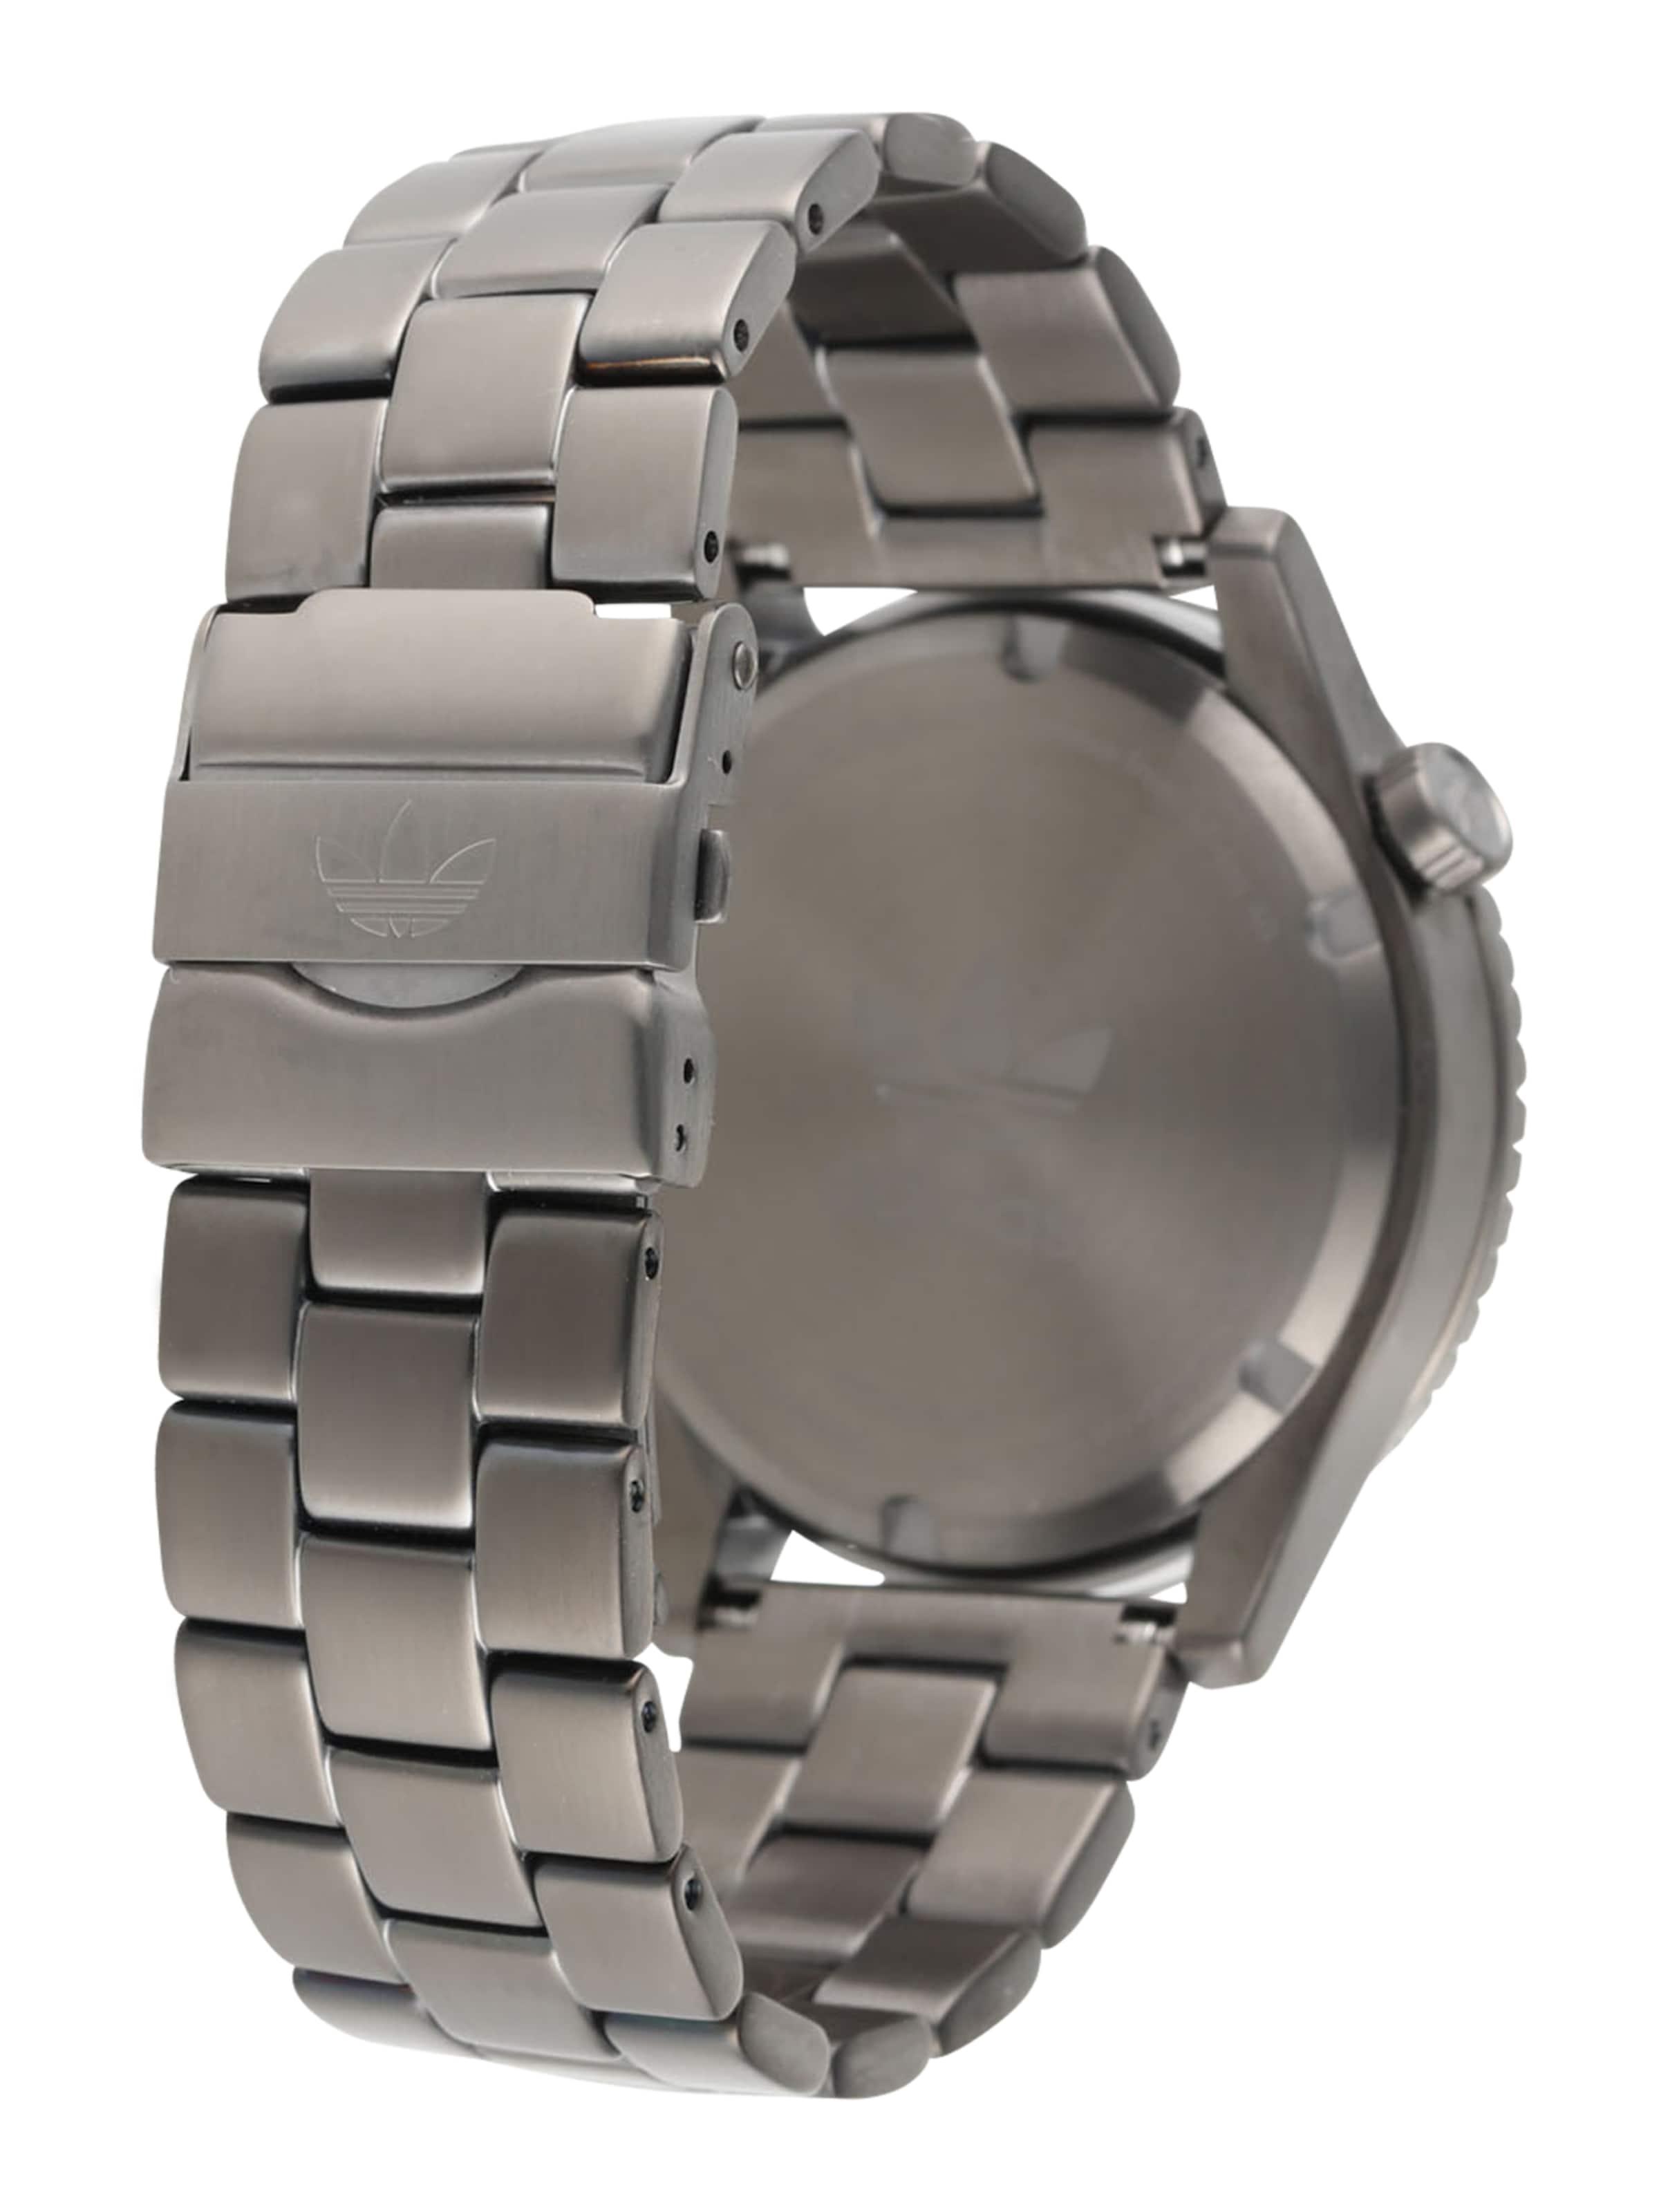 ADIDAS ORIGINALS Armbanduhr 'Cypher_M1' Billig Empfehlen pv9BZQu